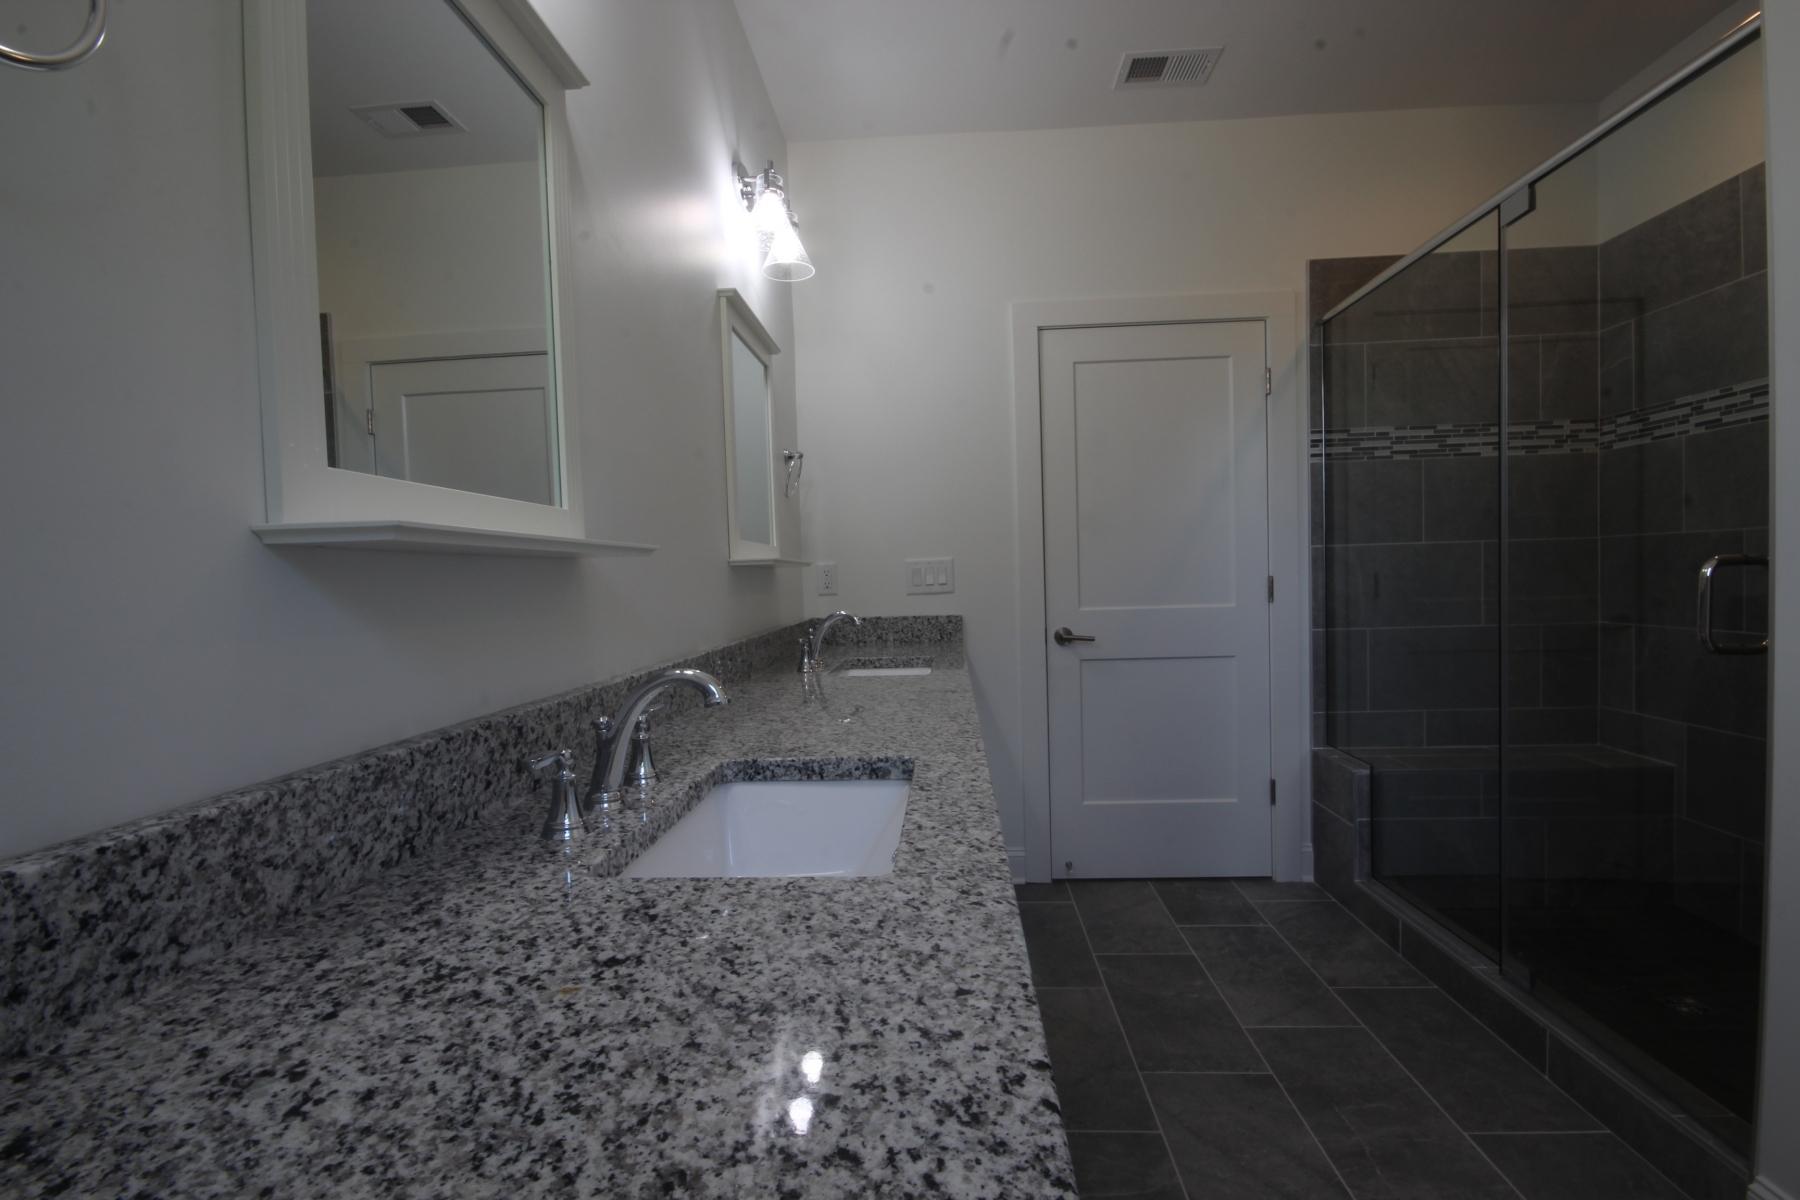 761-ss-bathroom-remodel-2